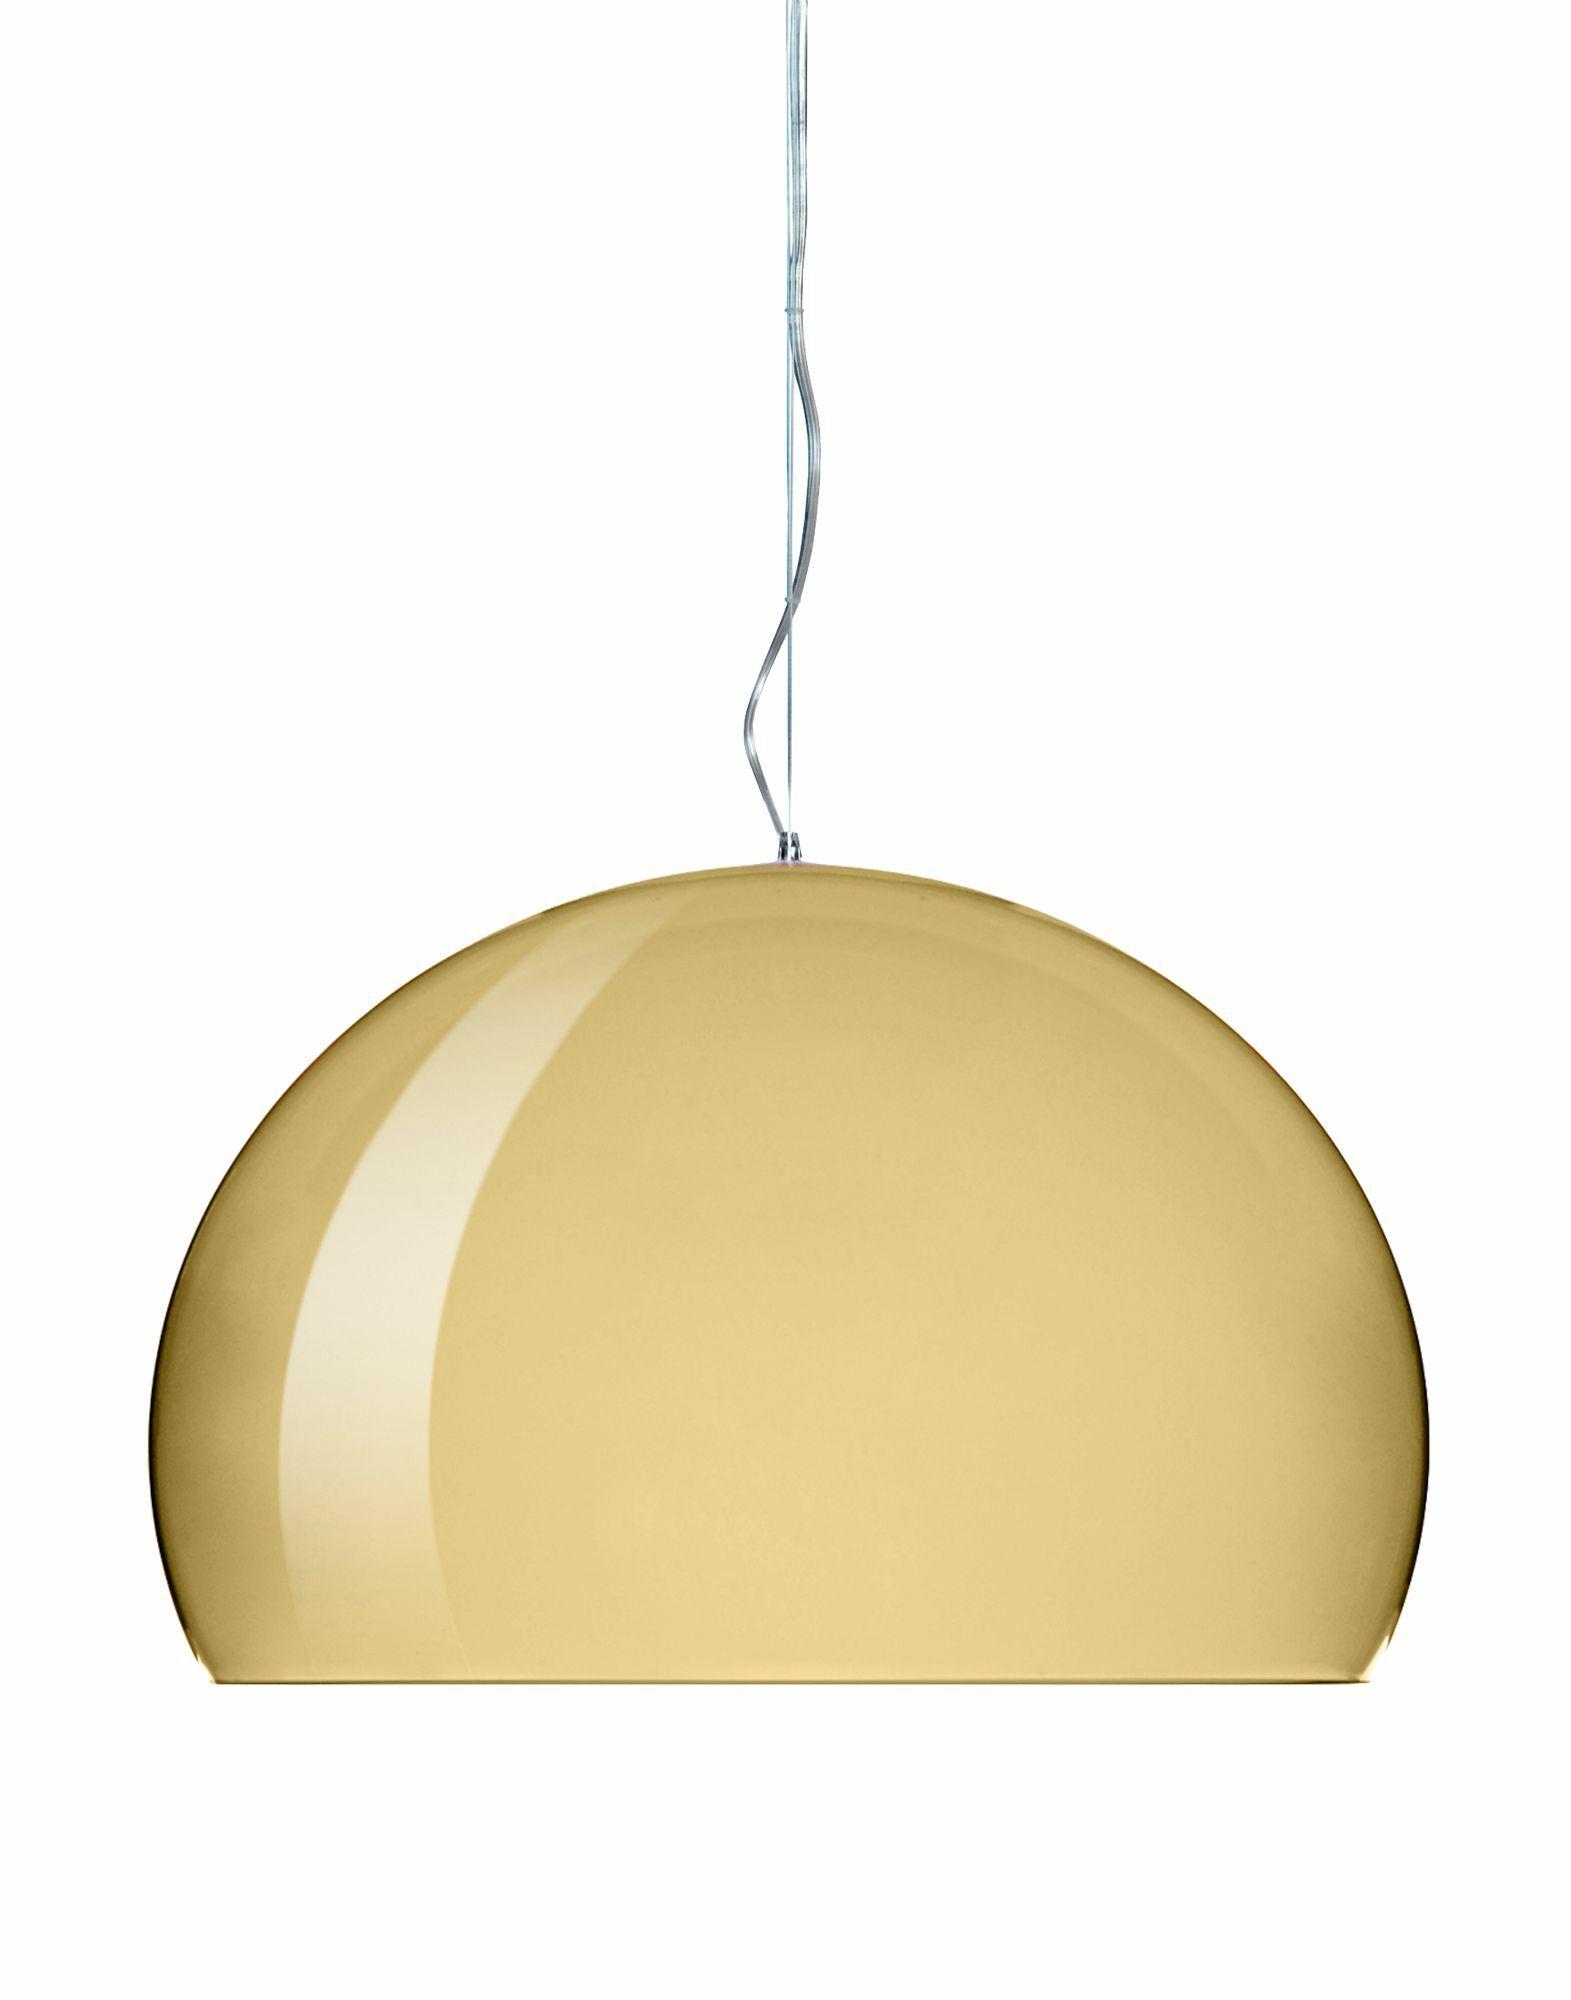 FL/Y M Hanging Lamp Size: 11